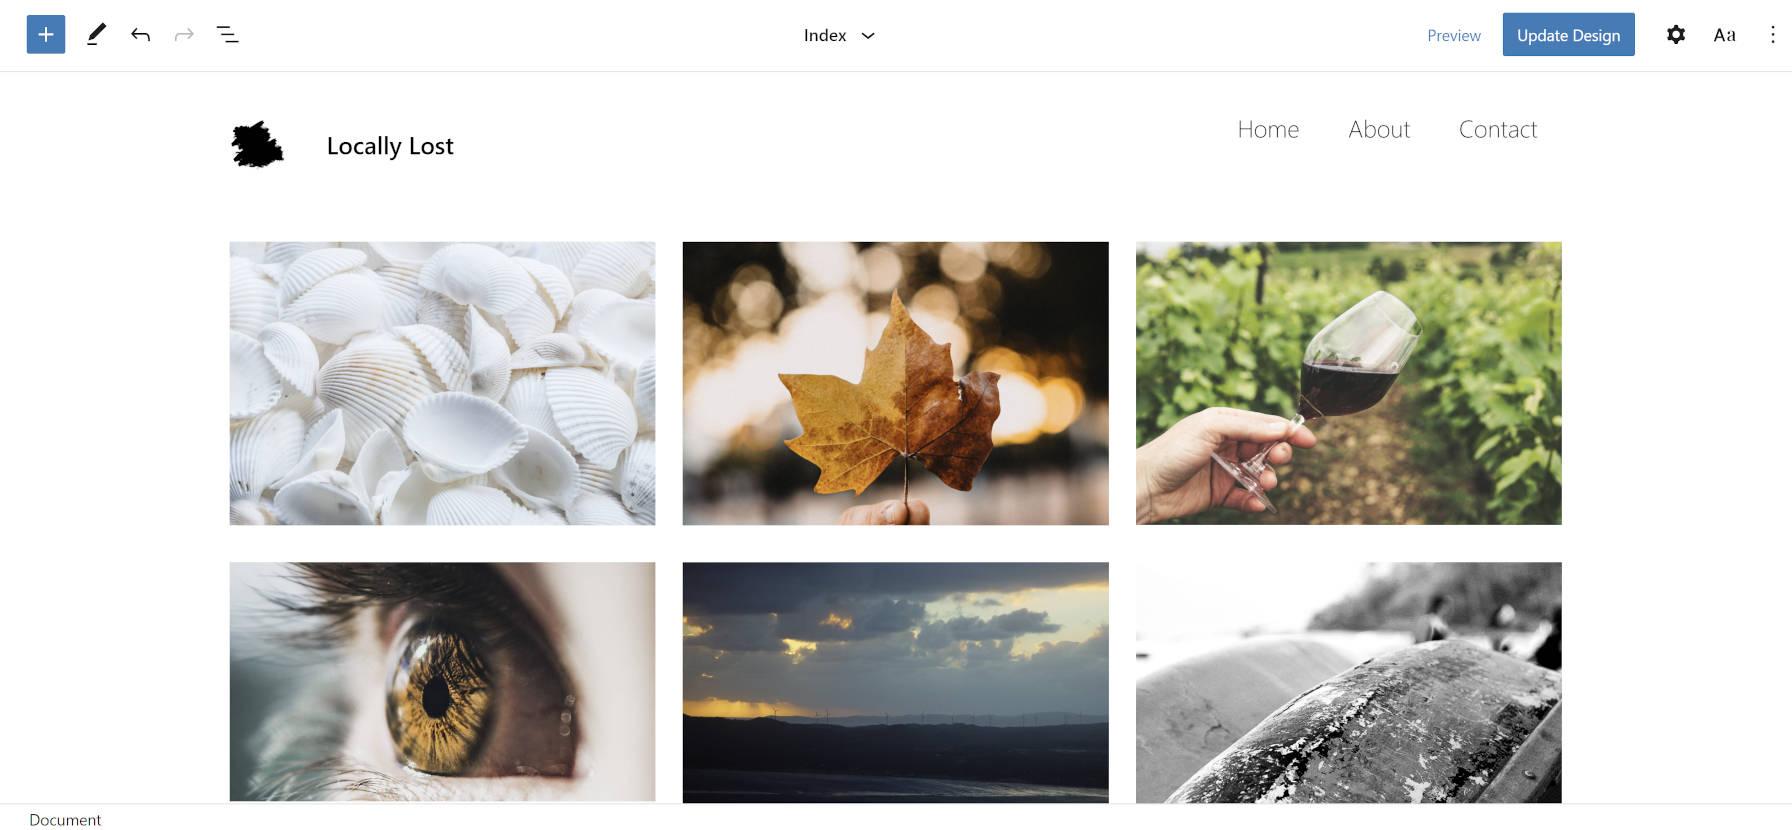 Photo Blocks theme in the site editor.